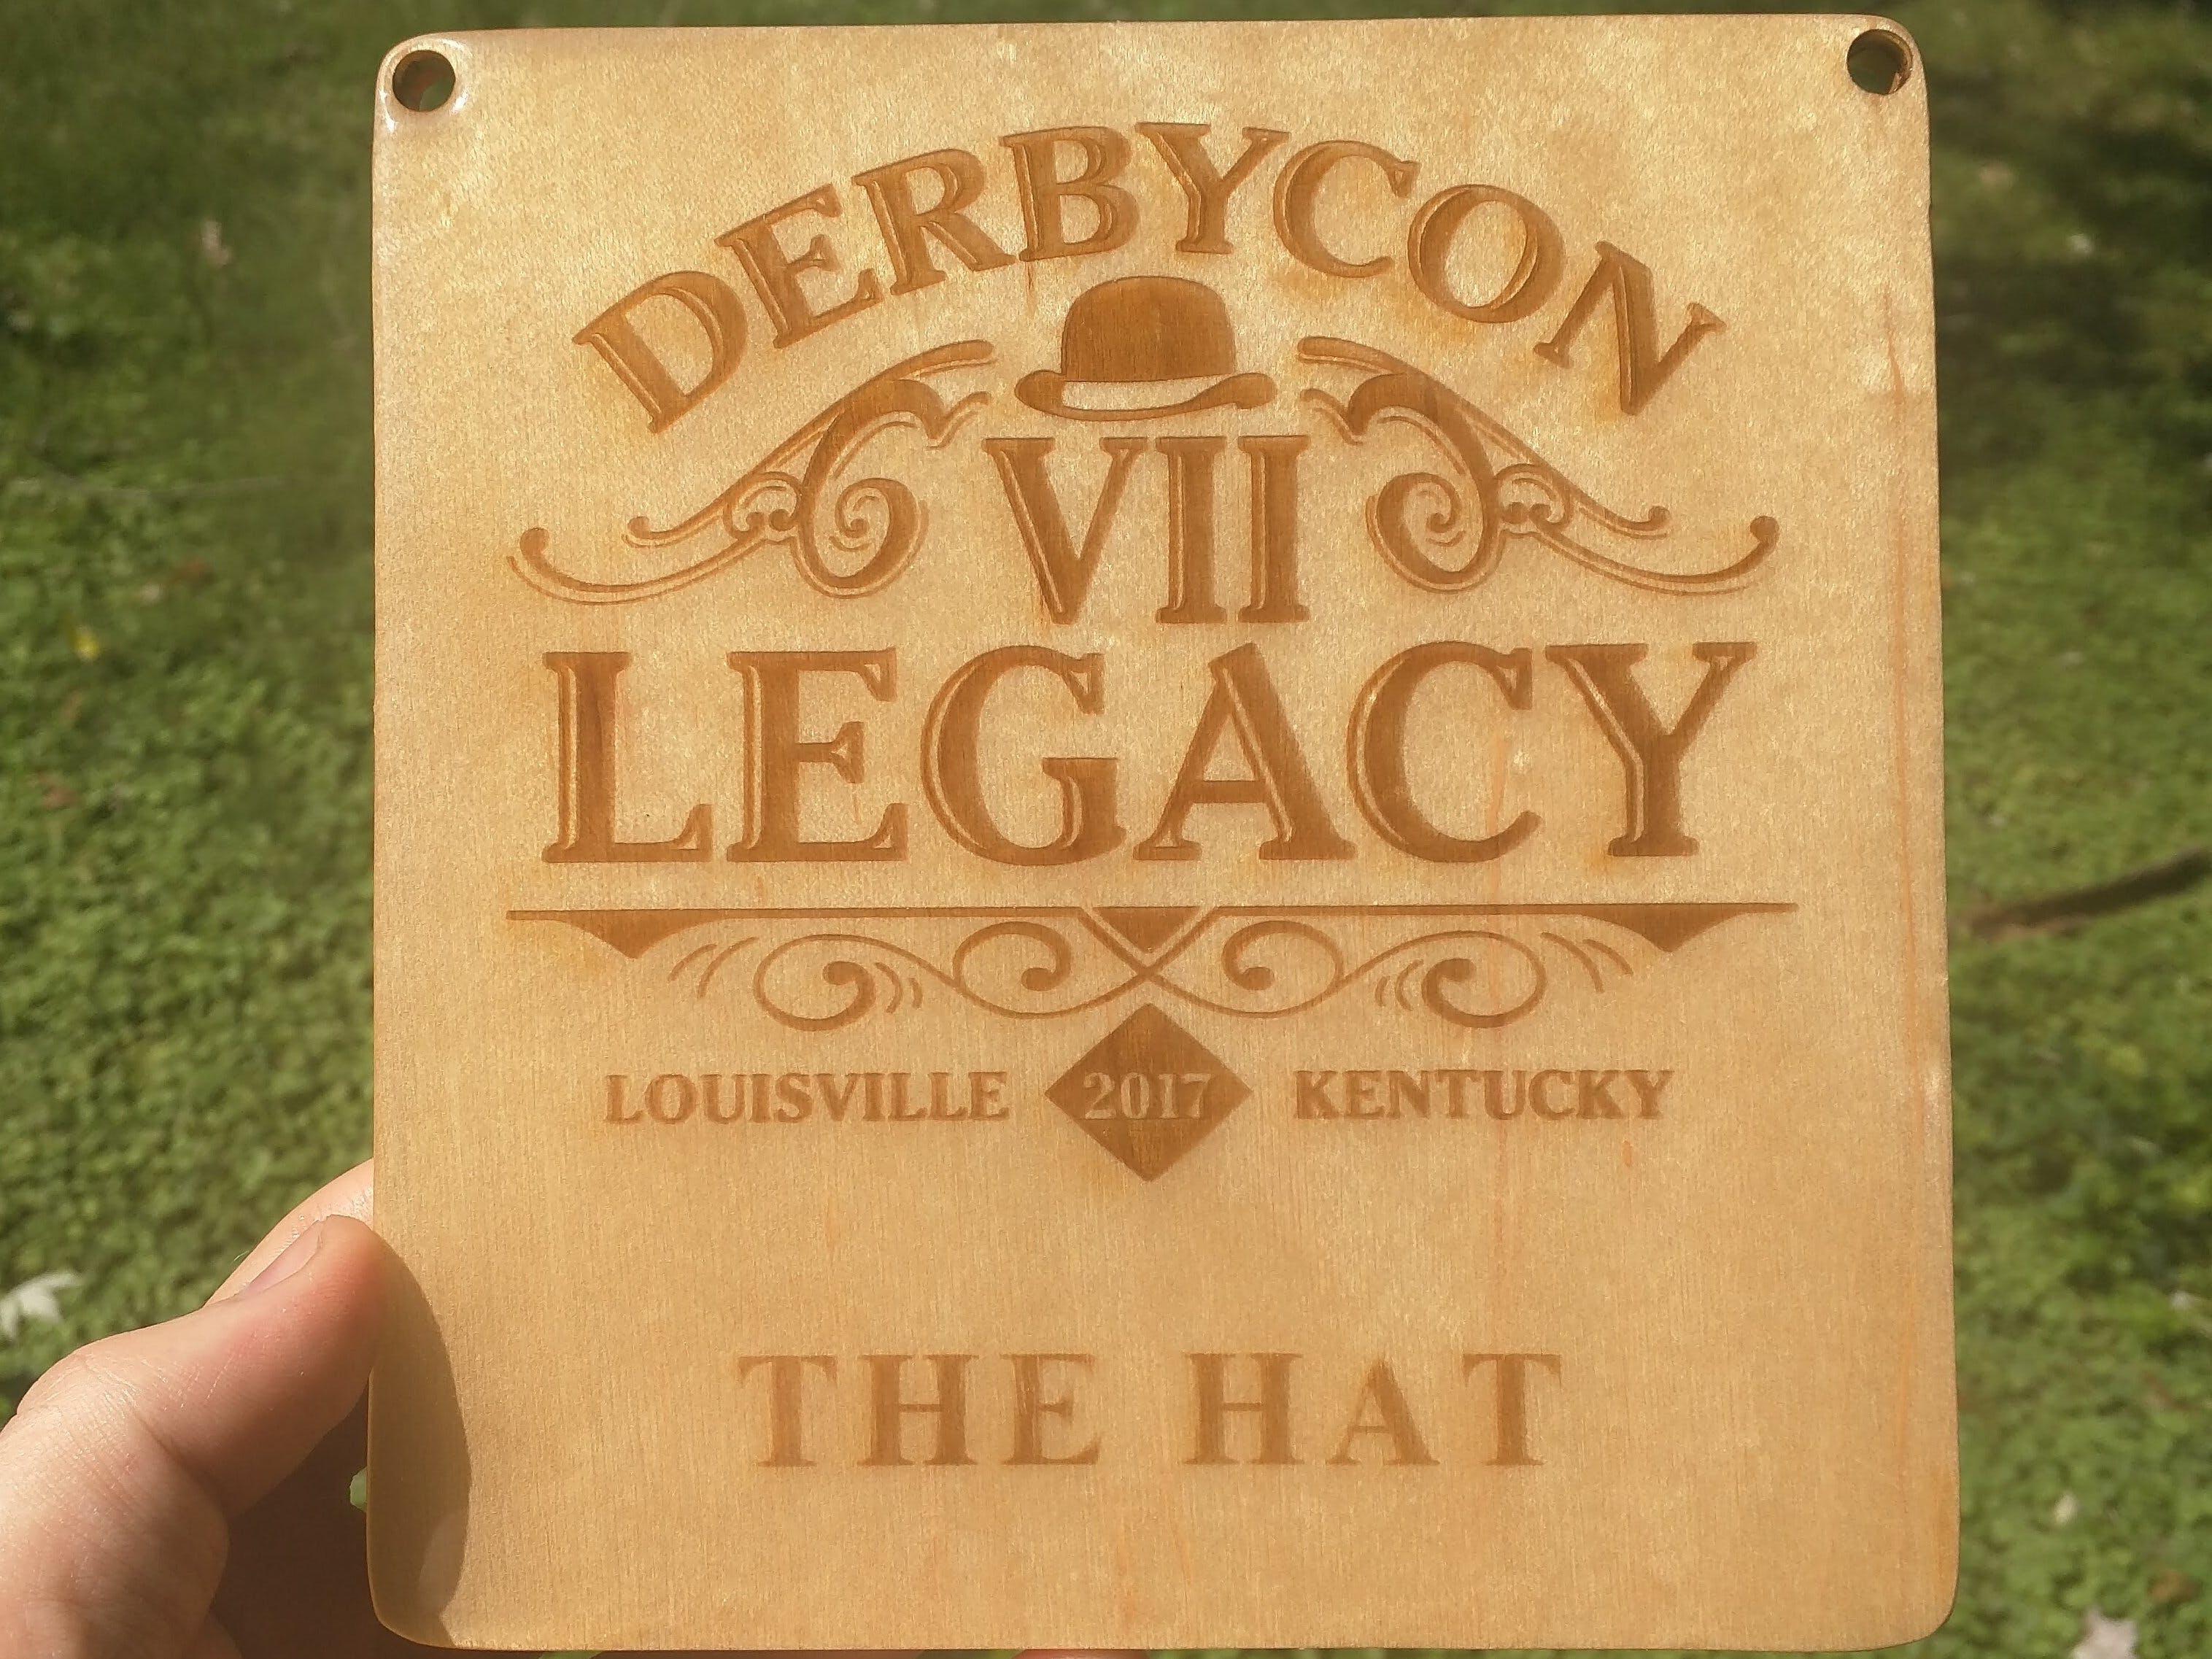 DerbyCon Legacy Black Badge